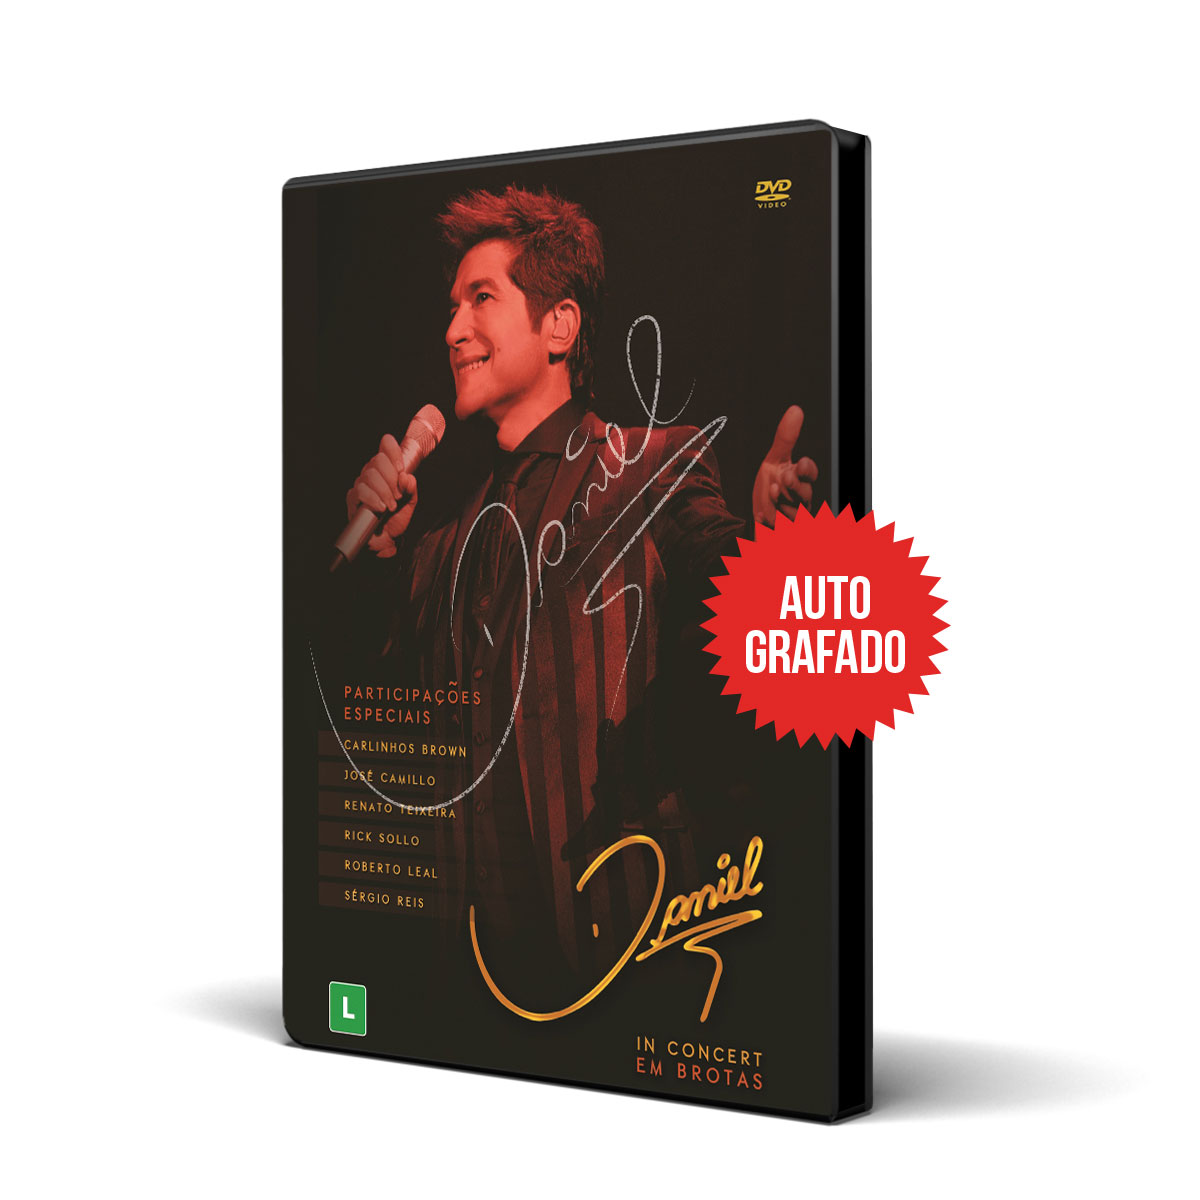 2º Lote Combo DVD Autografado Daniel In Concert em Brotas + Camiseta Masculina